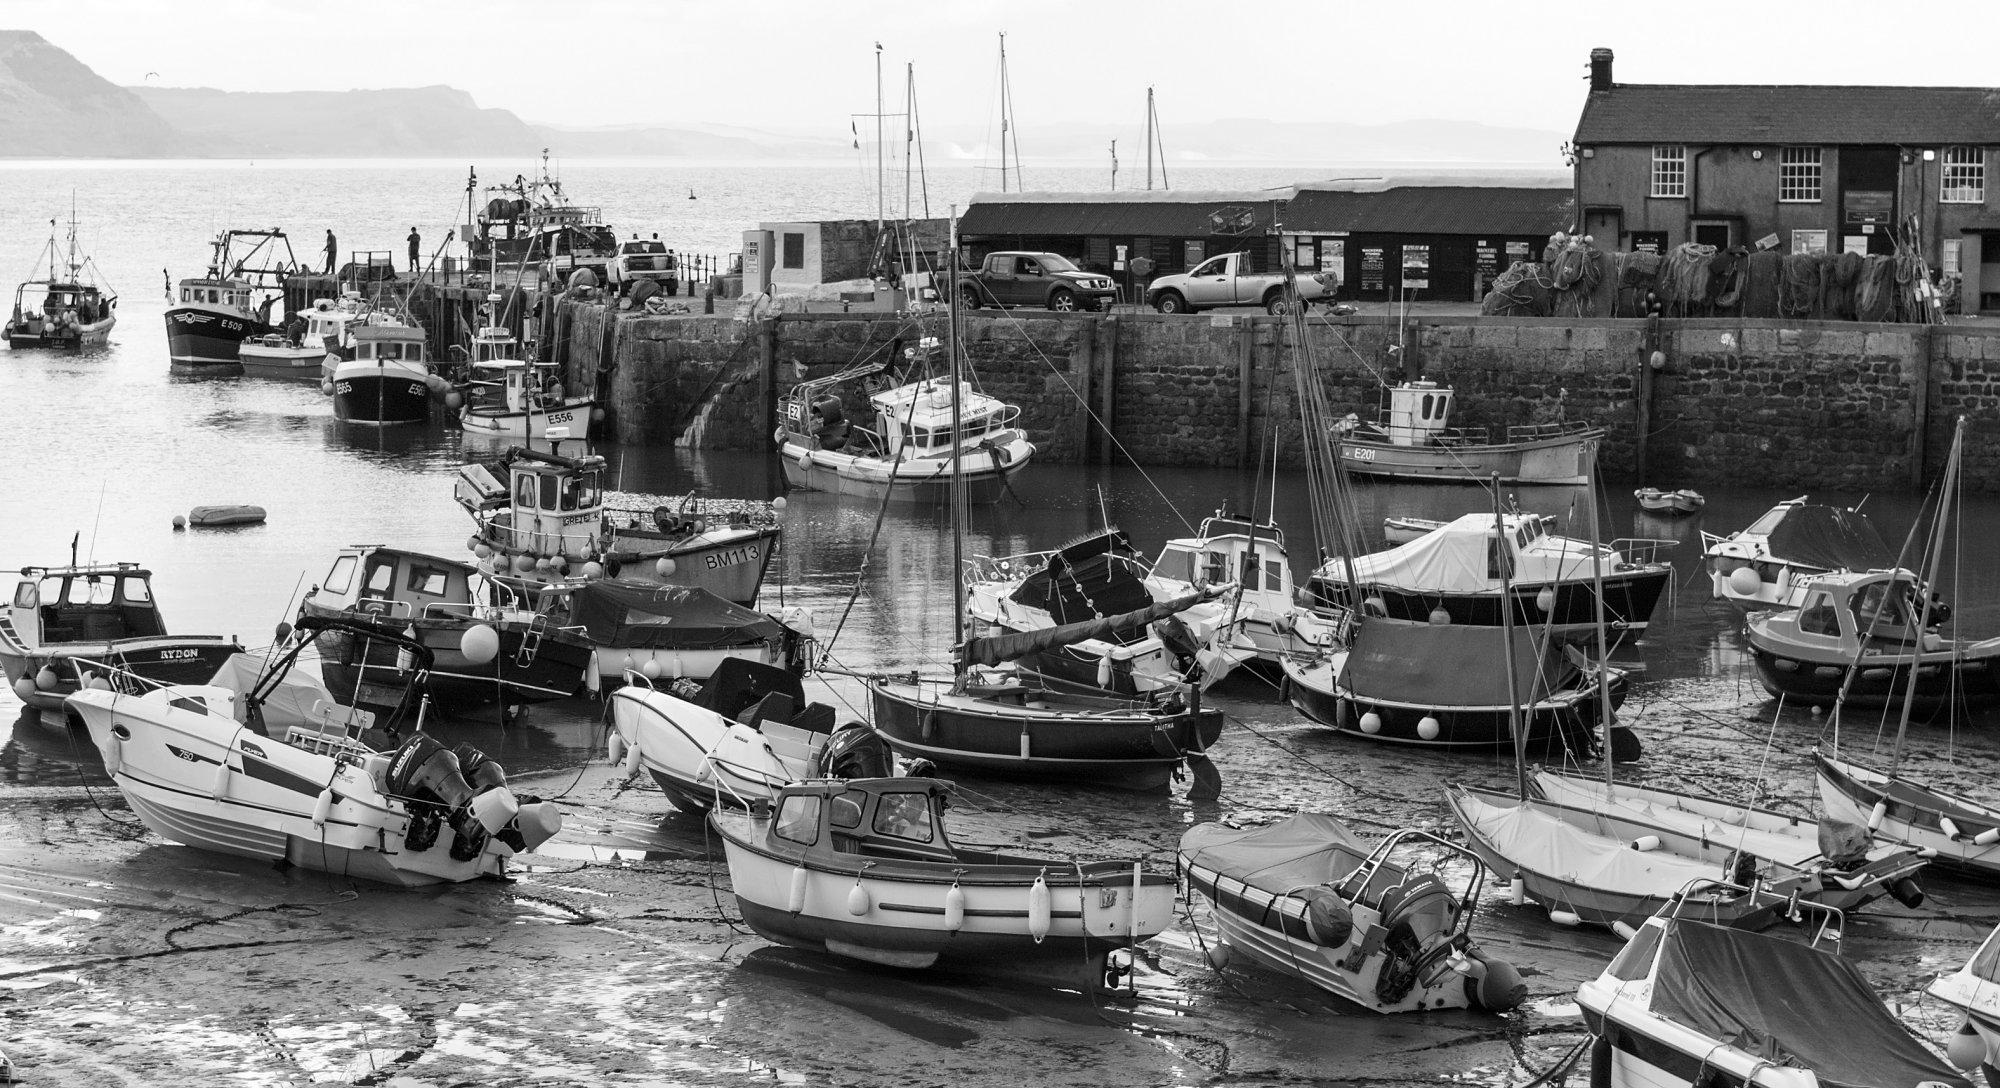 Harbour, Lyme Regis, at low tide